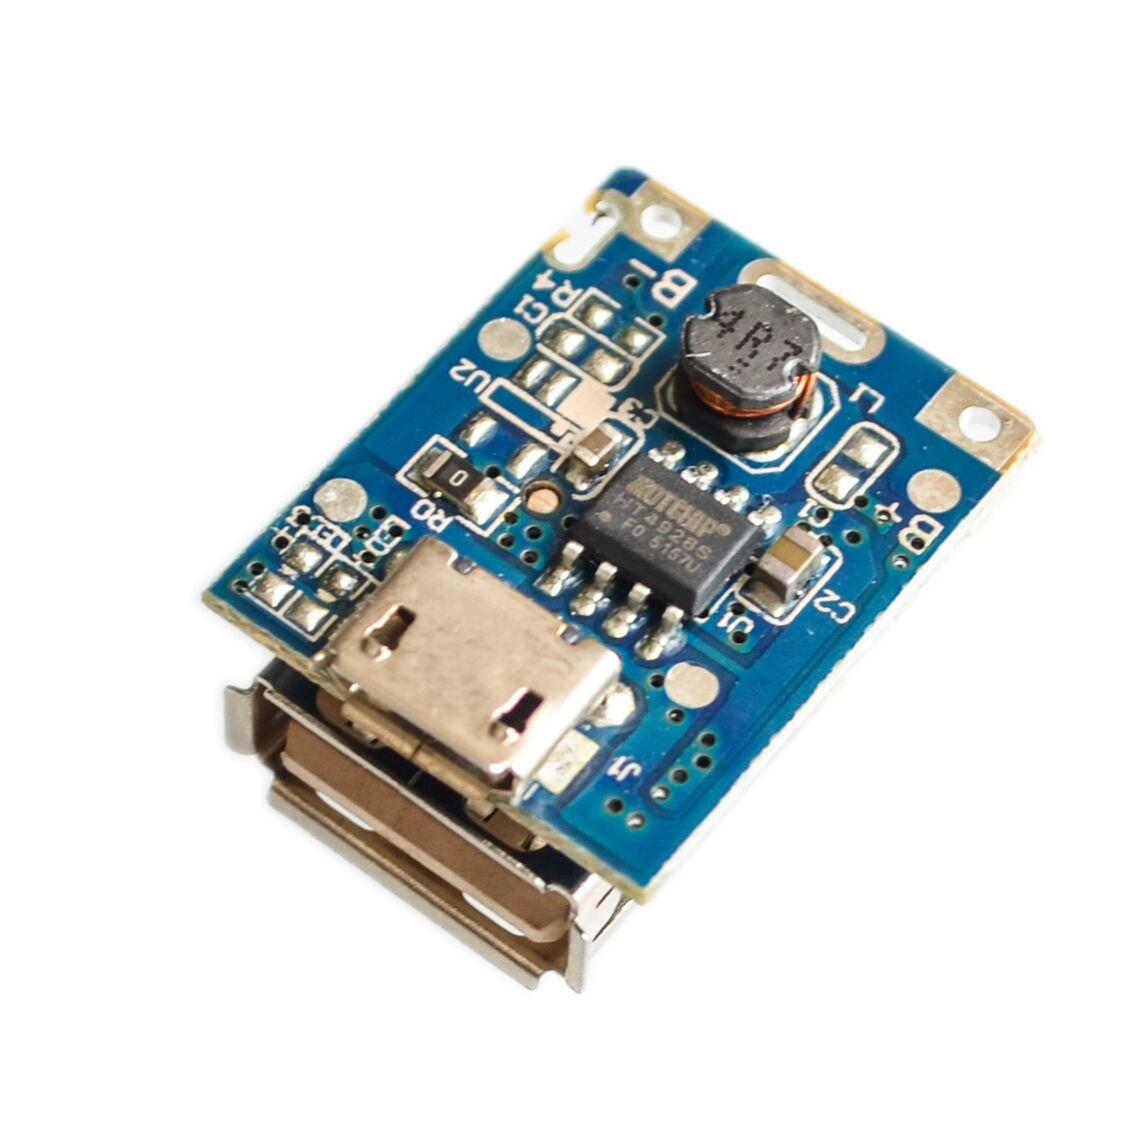 Модуль для павербанка 5 В Boost Step Up + Контроллер заряда с micro USB 134N3P 1